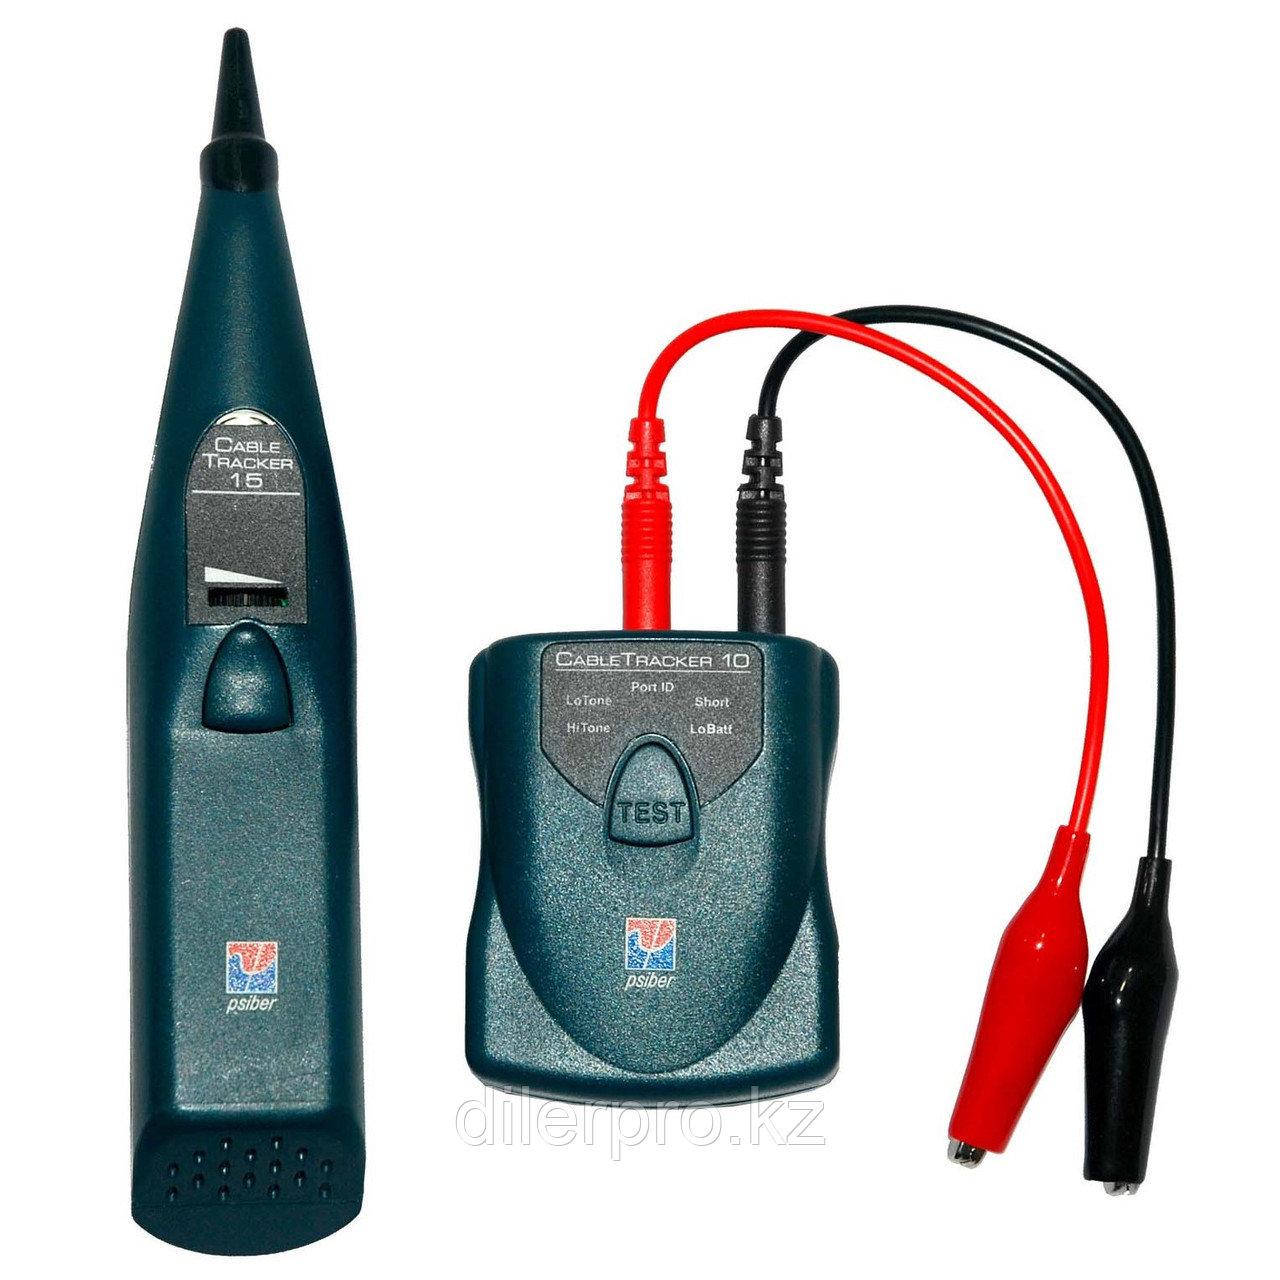 Softing CableTracker 1015 - тестовый набор